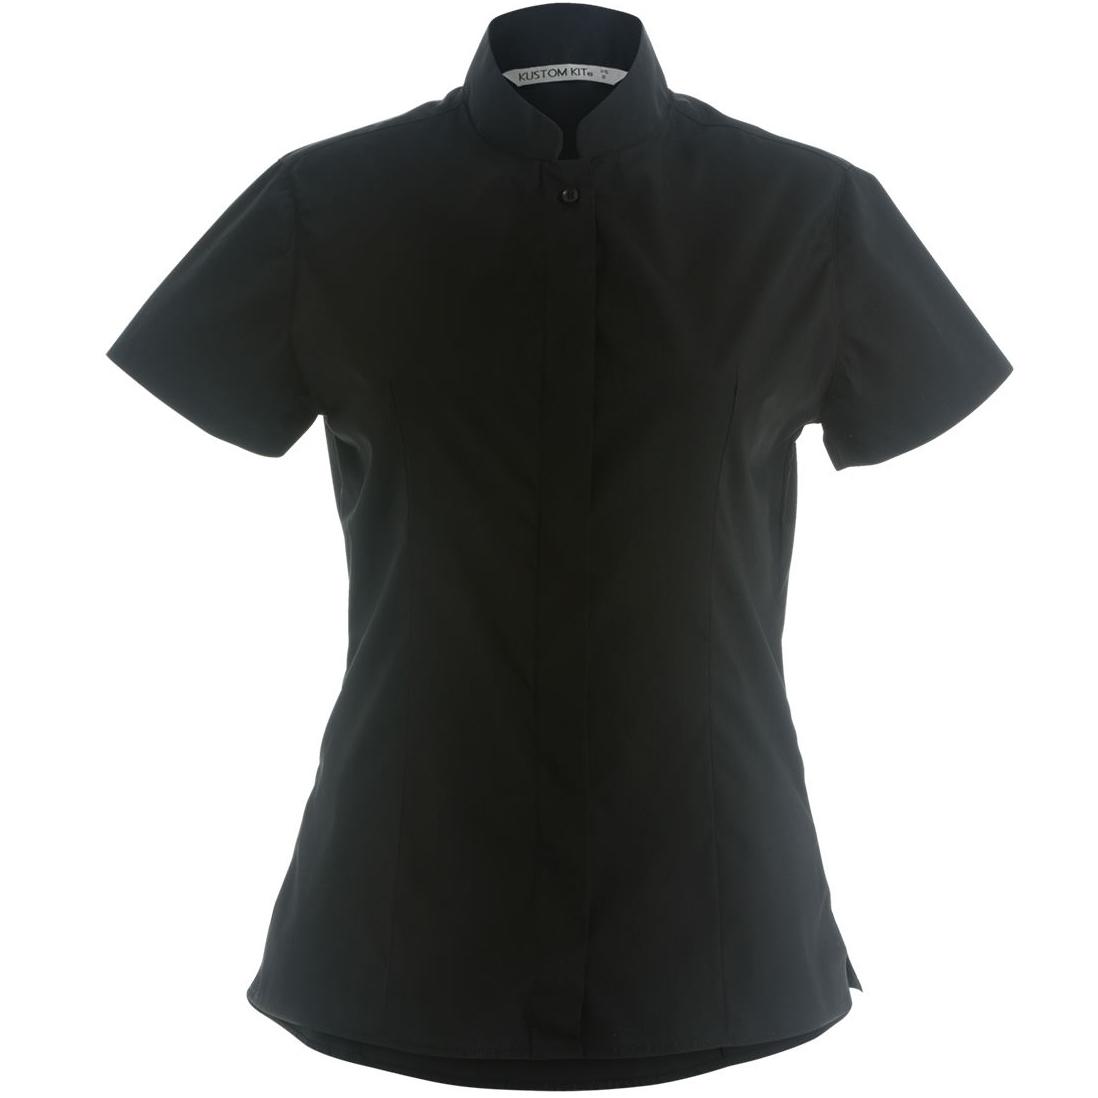 kustom kit damen hemd bluse mit stehkragen kurzarm ebay. Black Bedroom Furniture Sets. Home Design Ideas